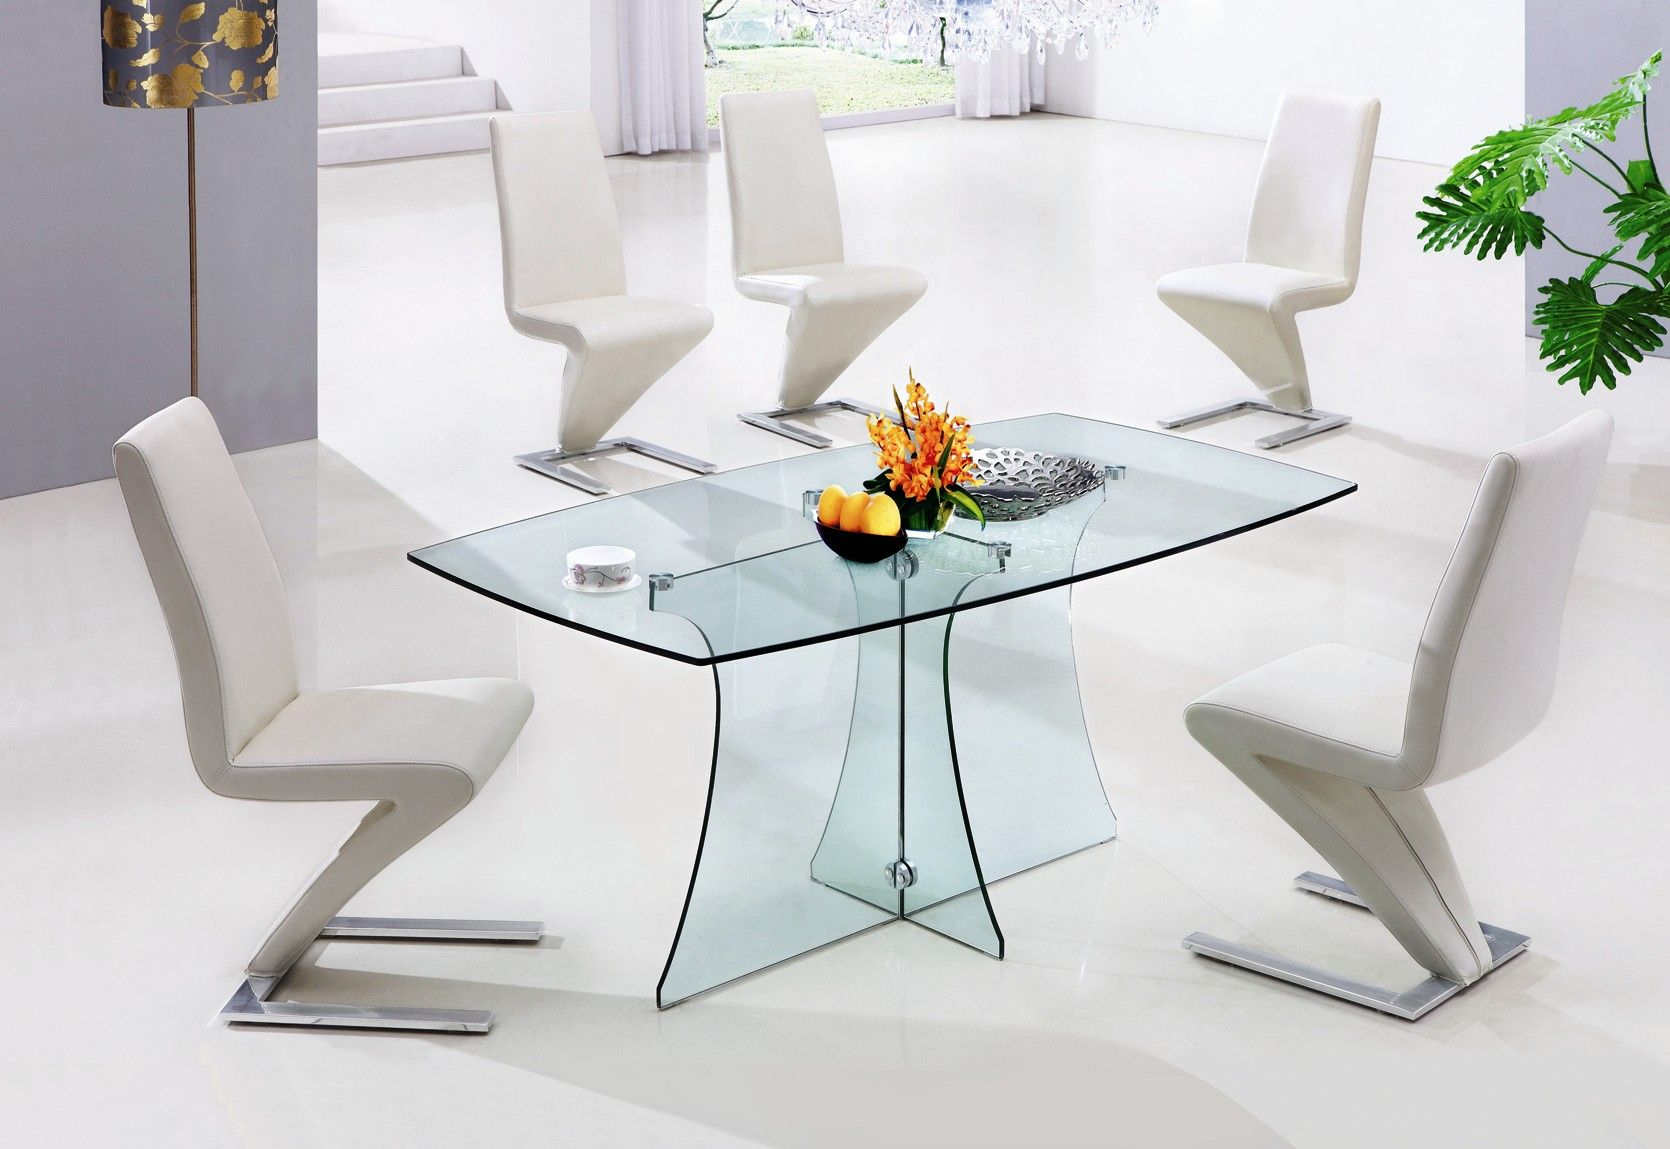 ideas for glass kitchen tables | Kitchen Design Ideas | Pinterest ...